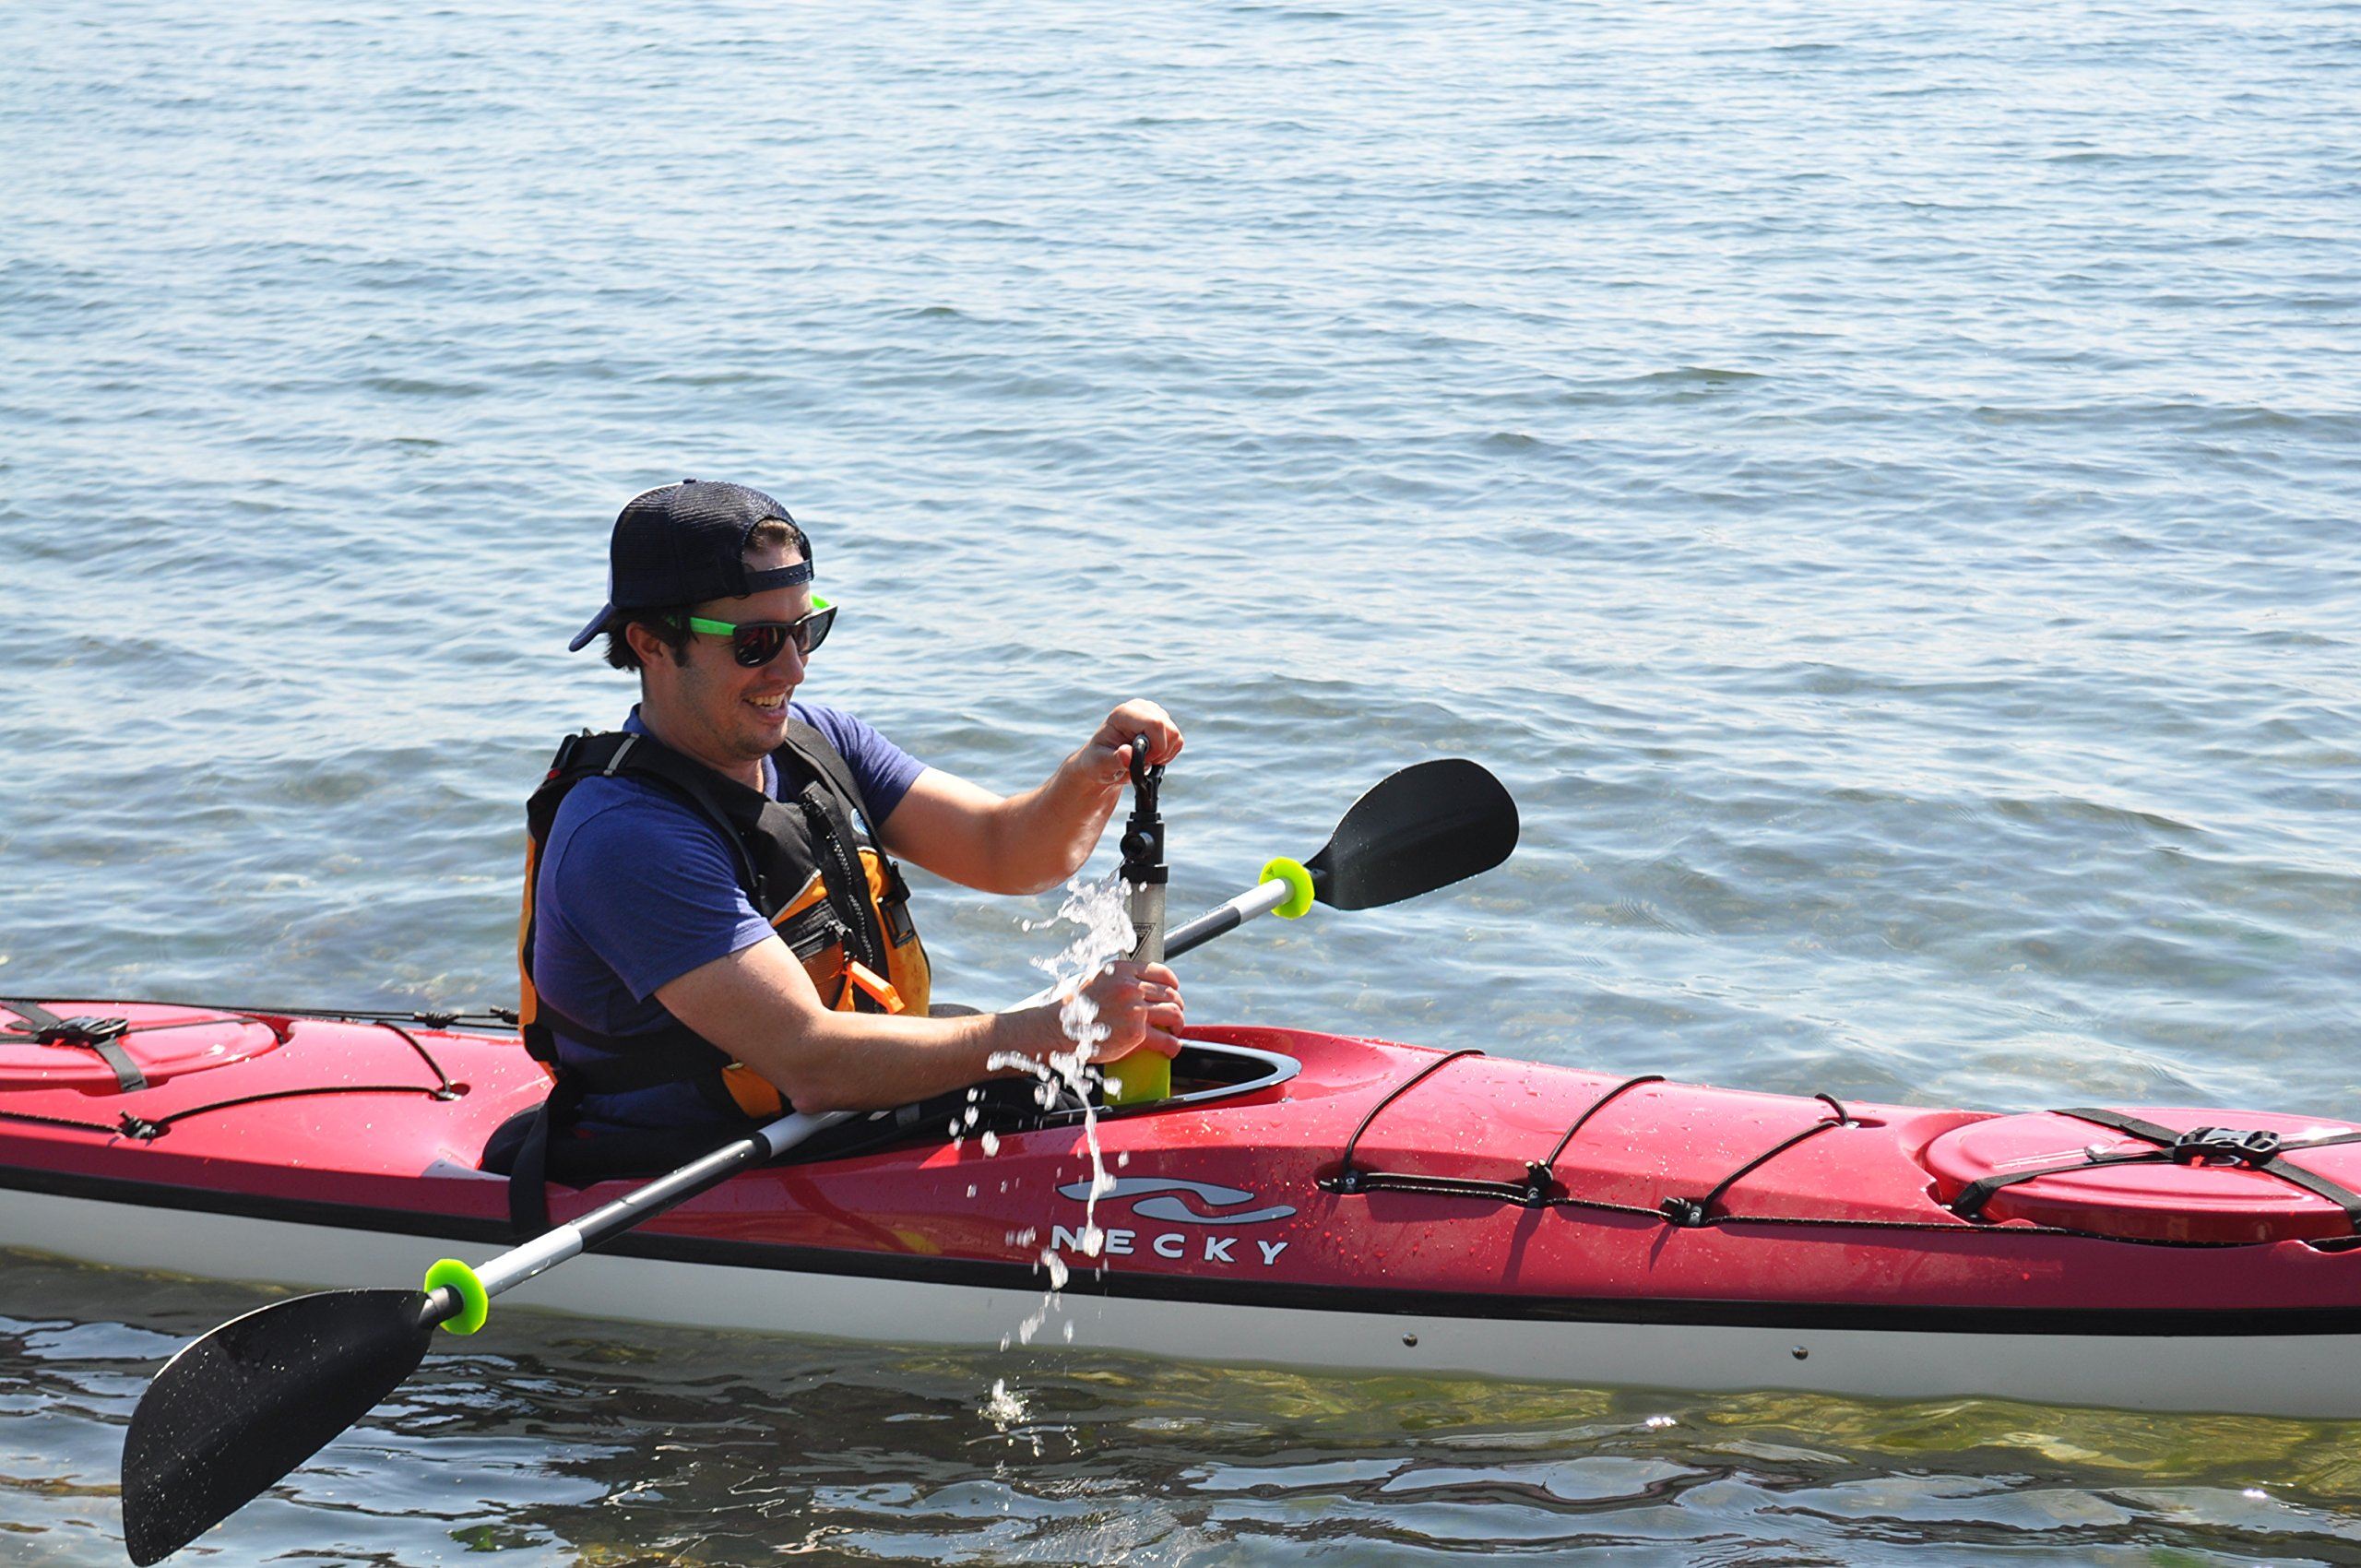 Seattle Sports Breakaway Bilge Pump - Modular Bilge Pump - Easy to Clean - Replaceable Parts - Kayak/Canoe/Boat by Seattle Sports (Image #3)